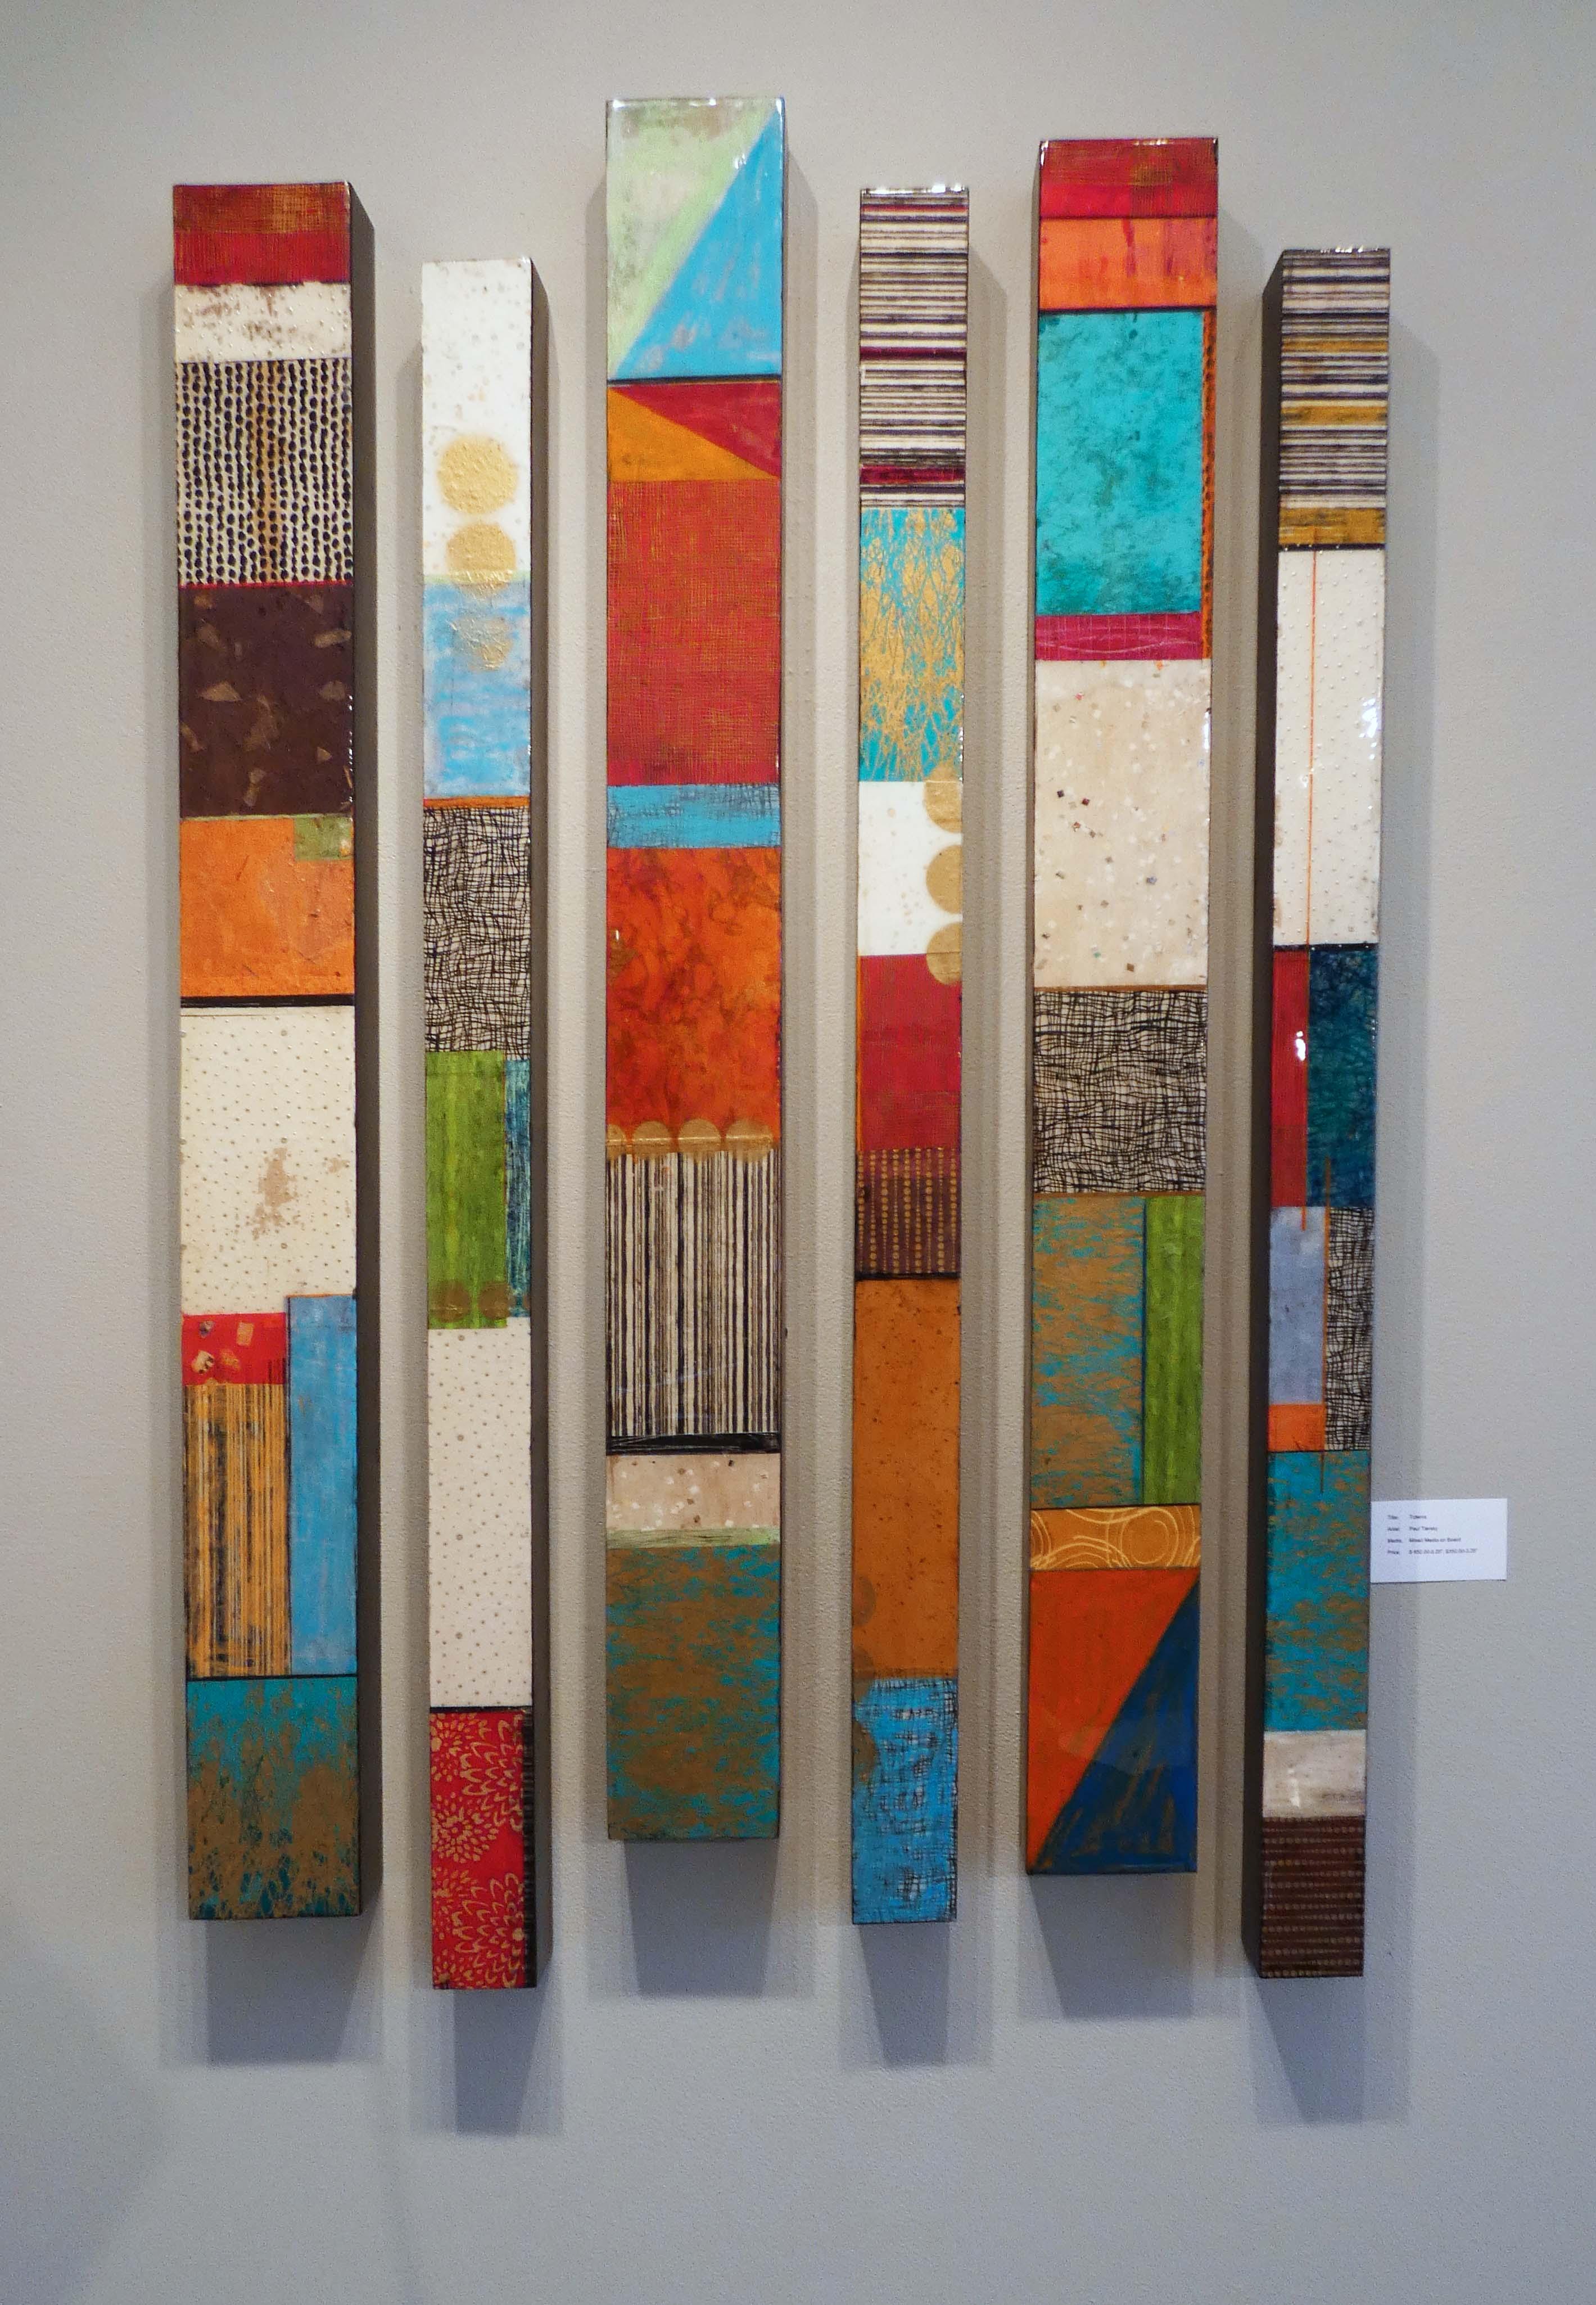 Tiersky sticks